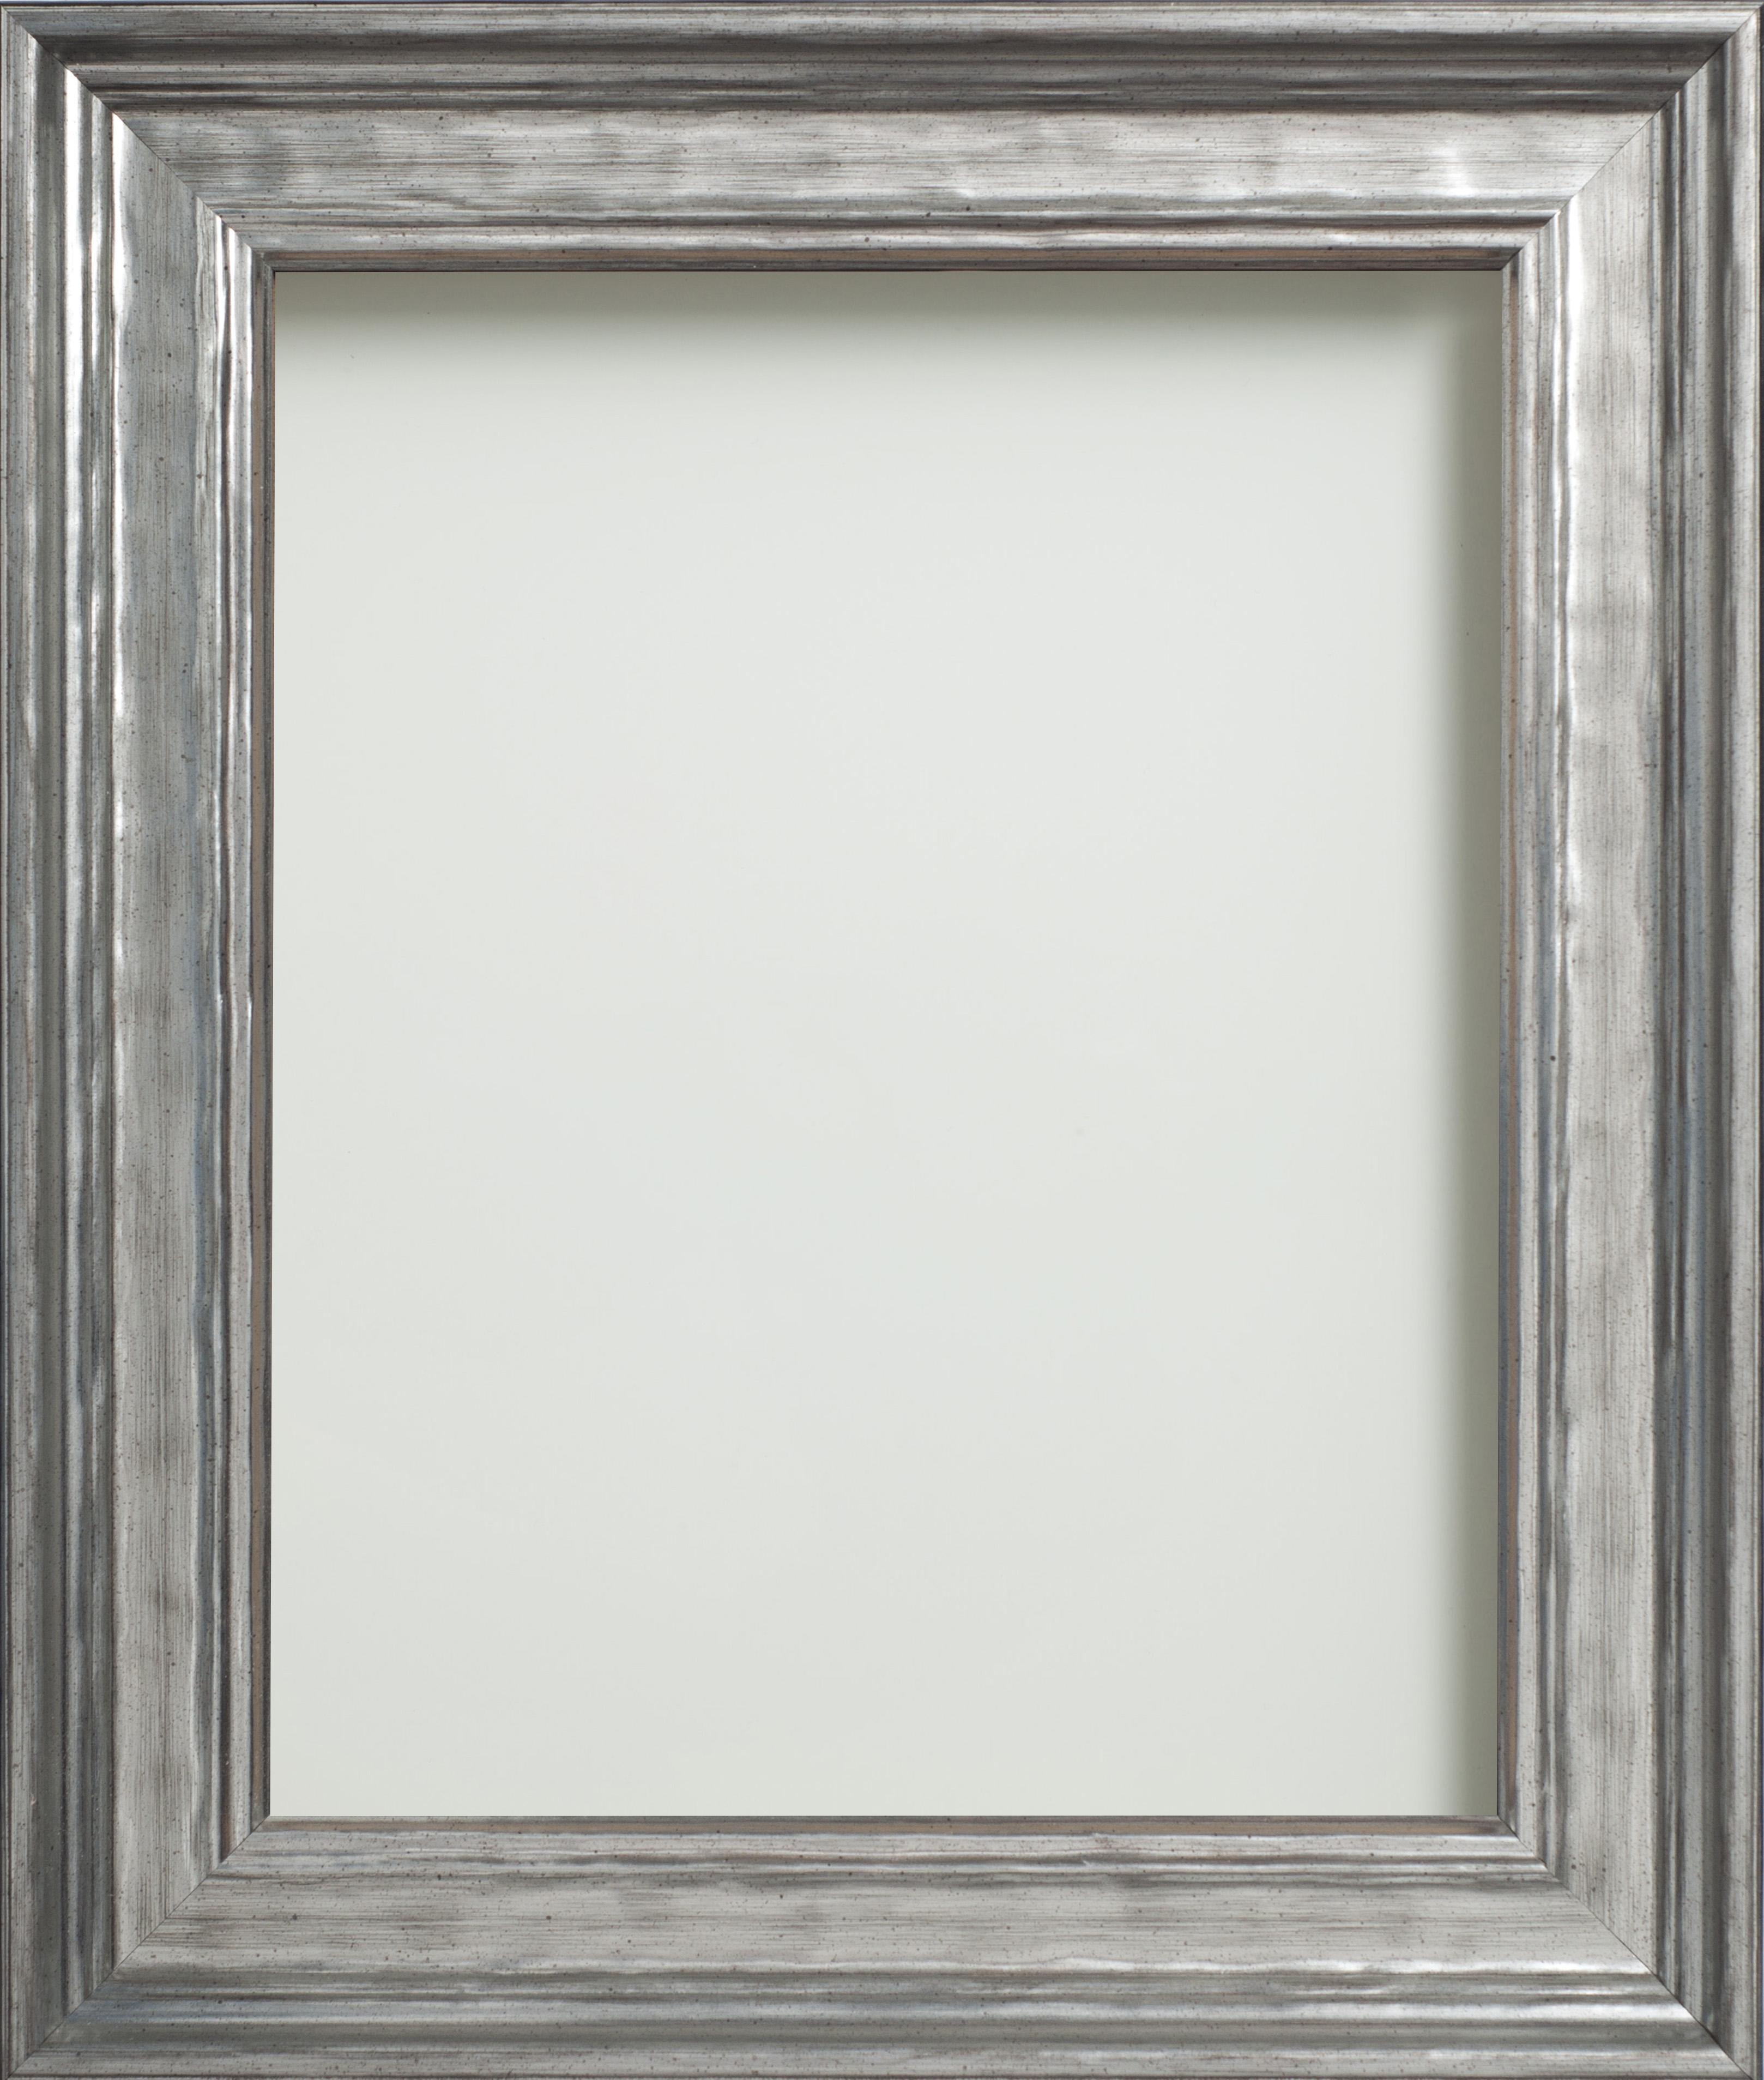 Frame Company Farraday Range Gold Or Silver Leaf Effect Photo Frames